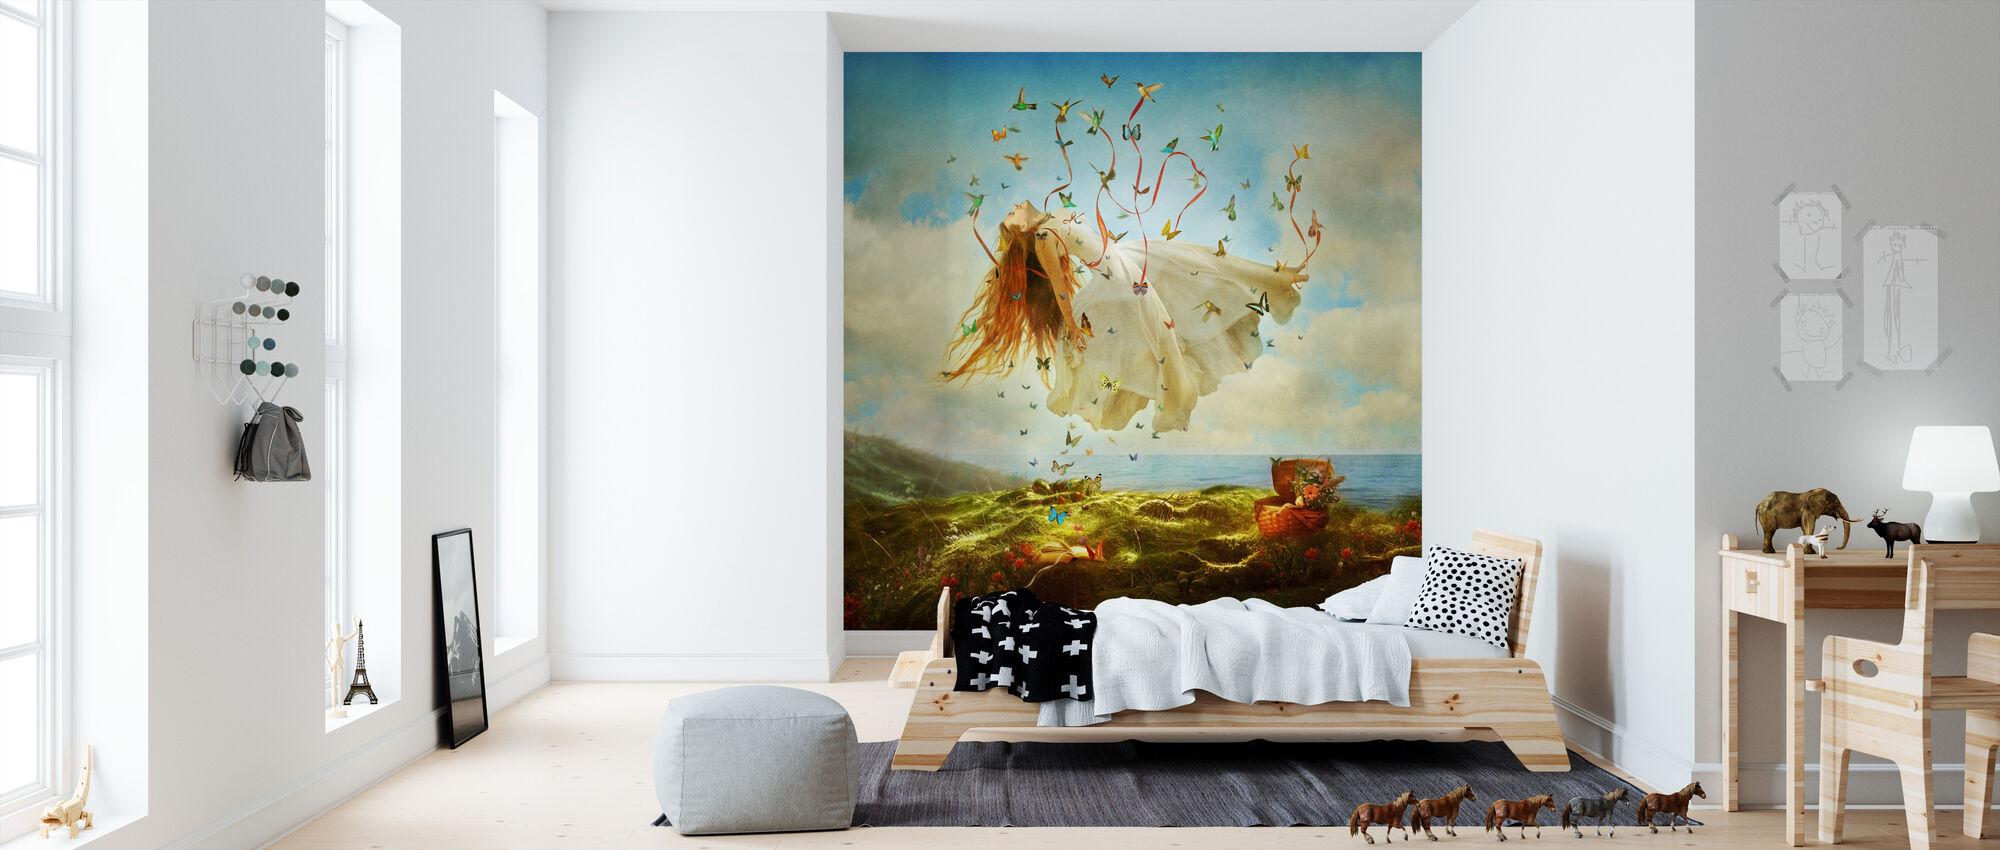 Daydreams - Wallpaper - Kids Room